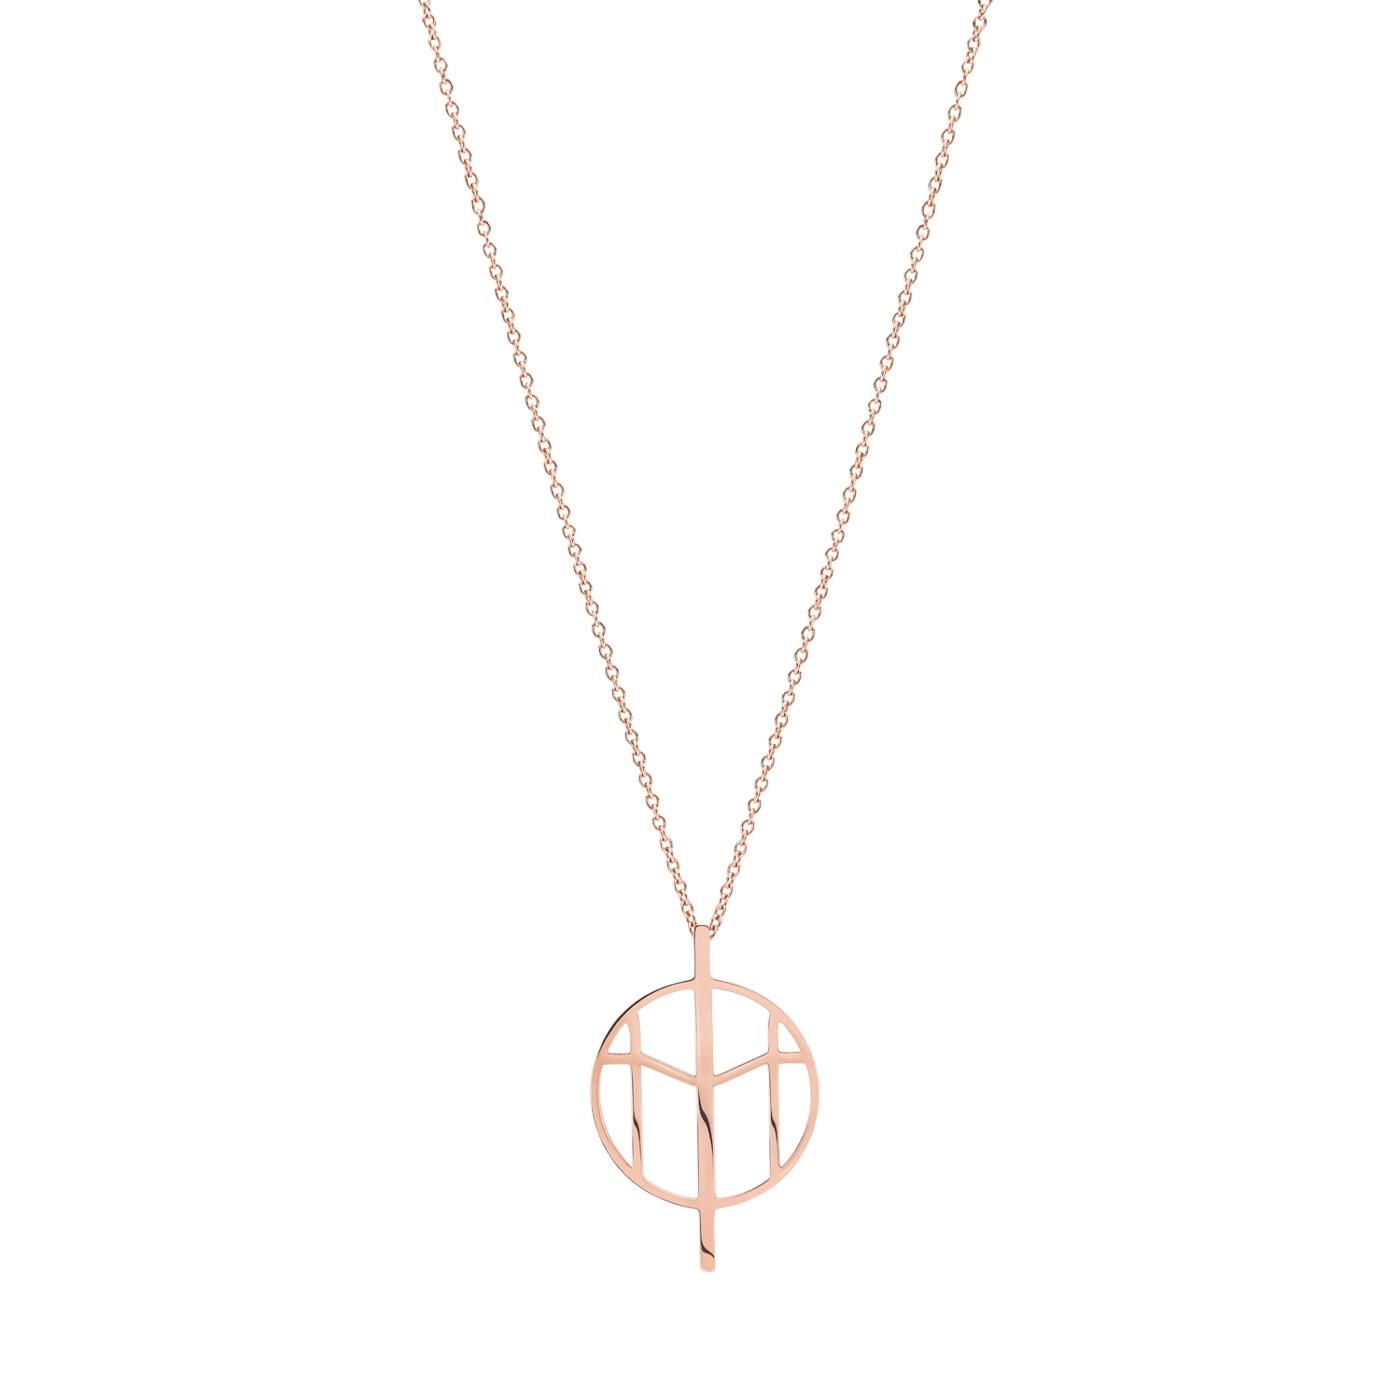 M-Necklace-RG